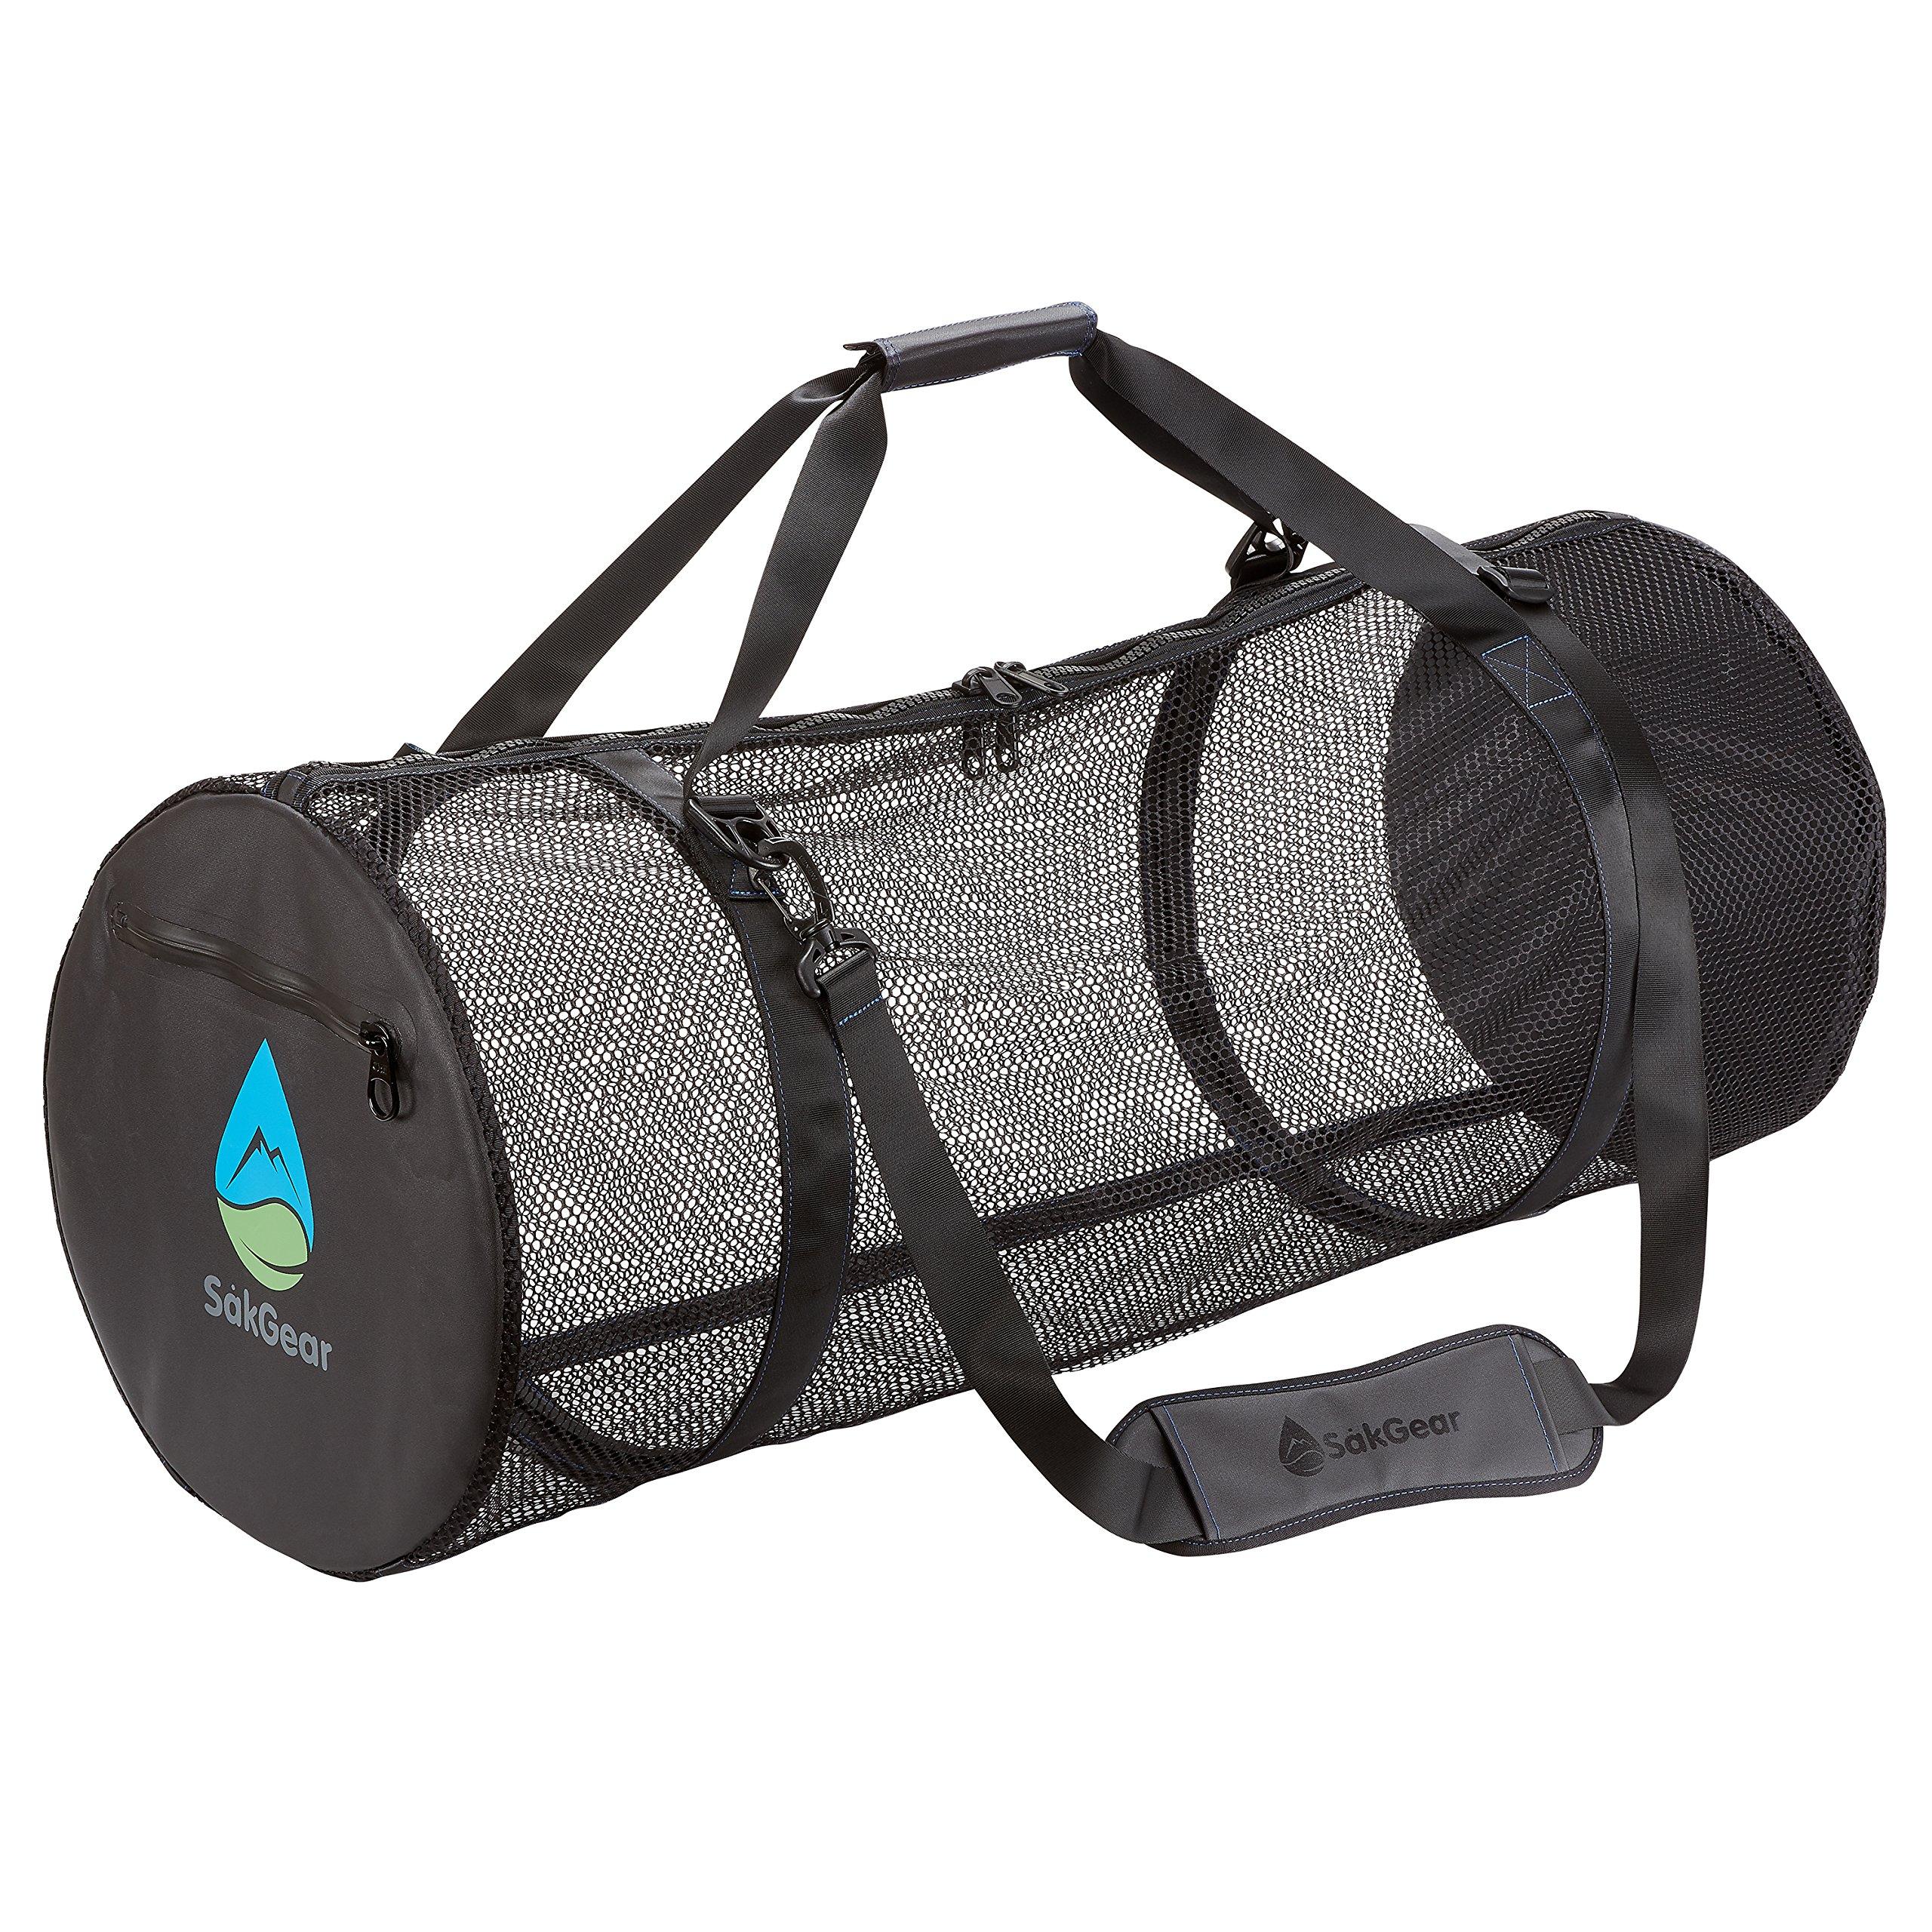 Såk Gear SCUBASåk | Premium Collapsible Mesh Duffle Bag for SCUBA and Dive Equipment | Features Exterior Waterproof Pocket & Adjustable Shoulder Strap | by